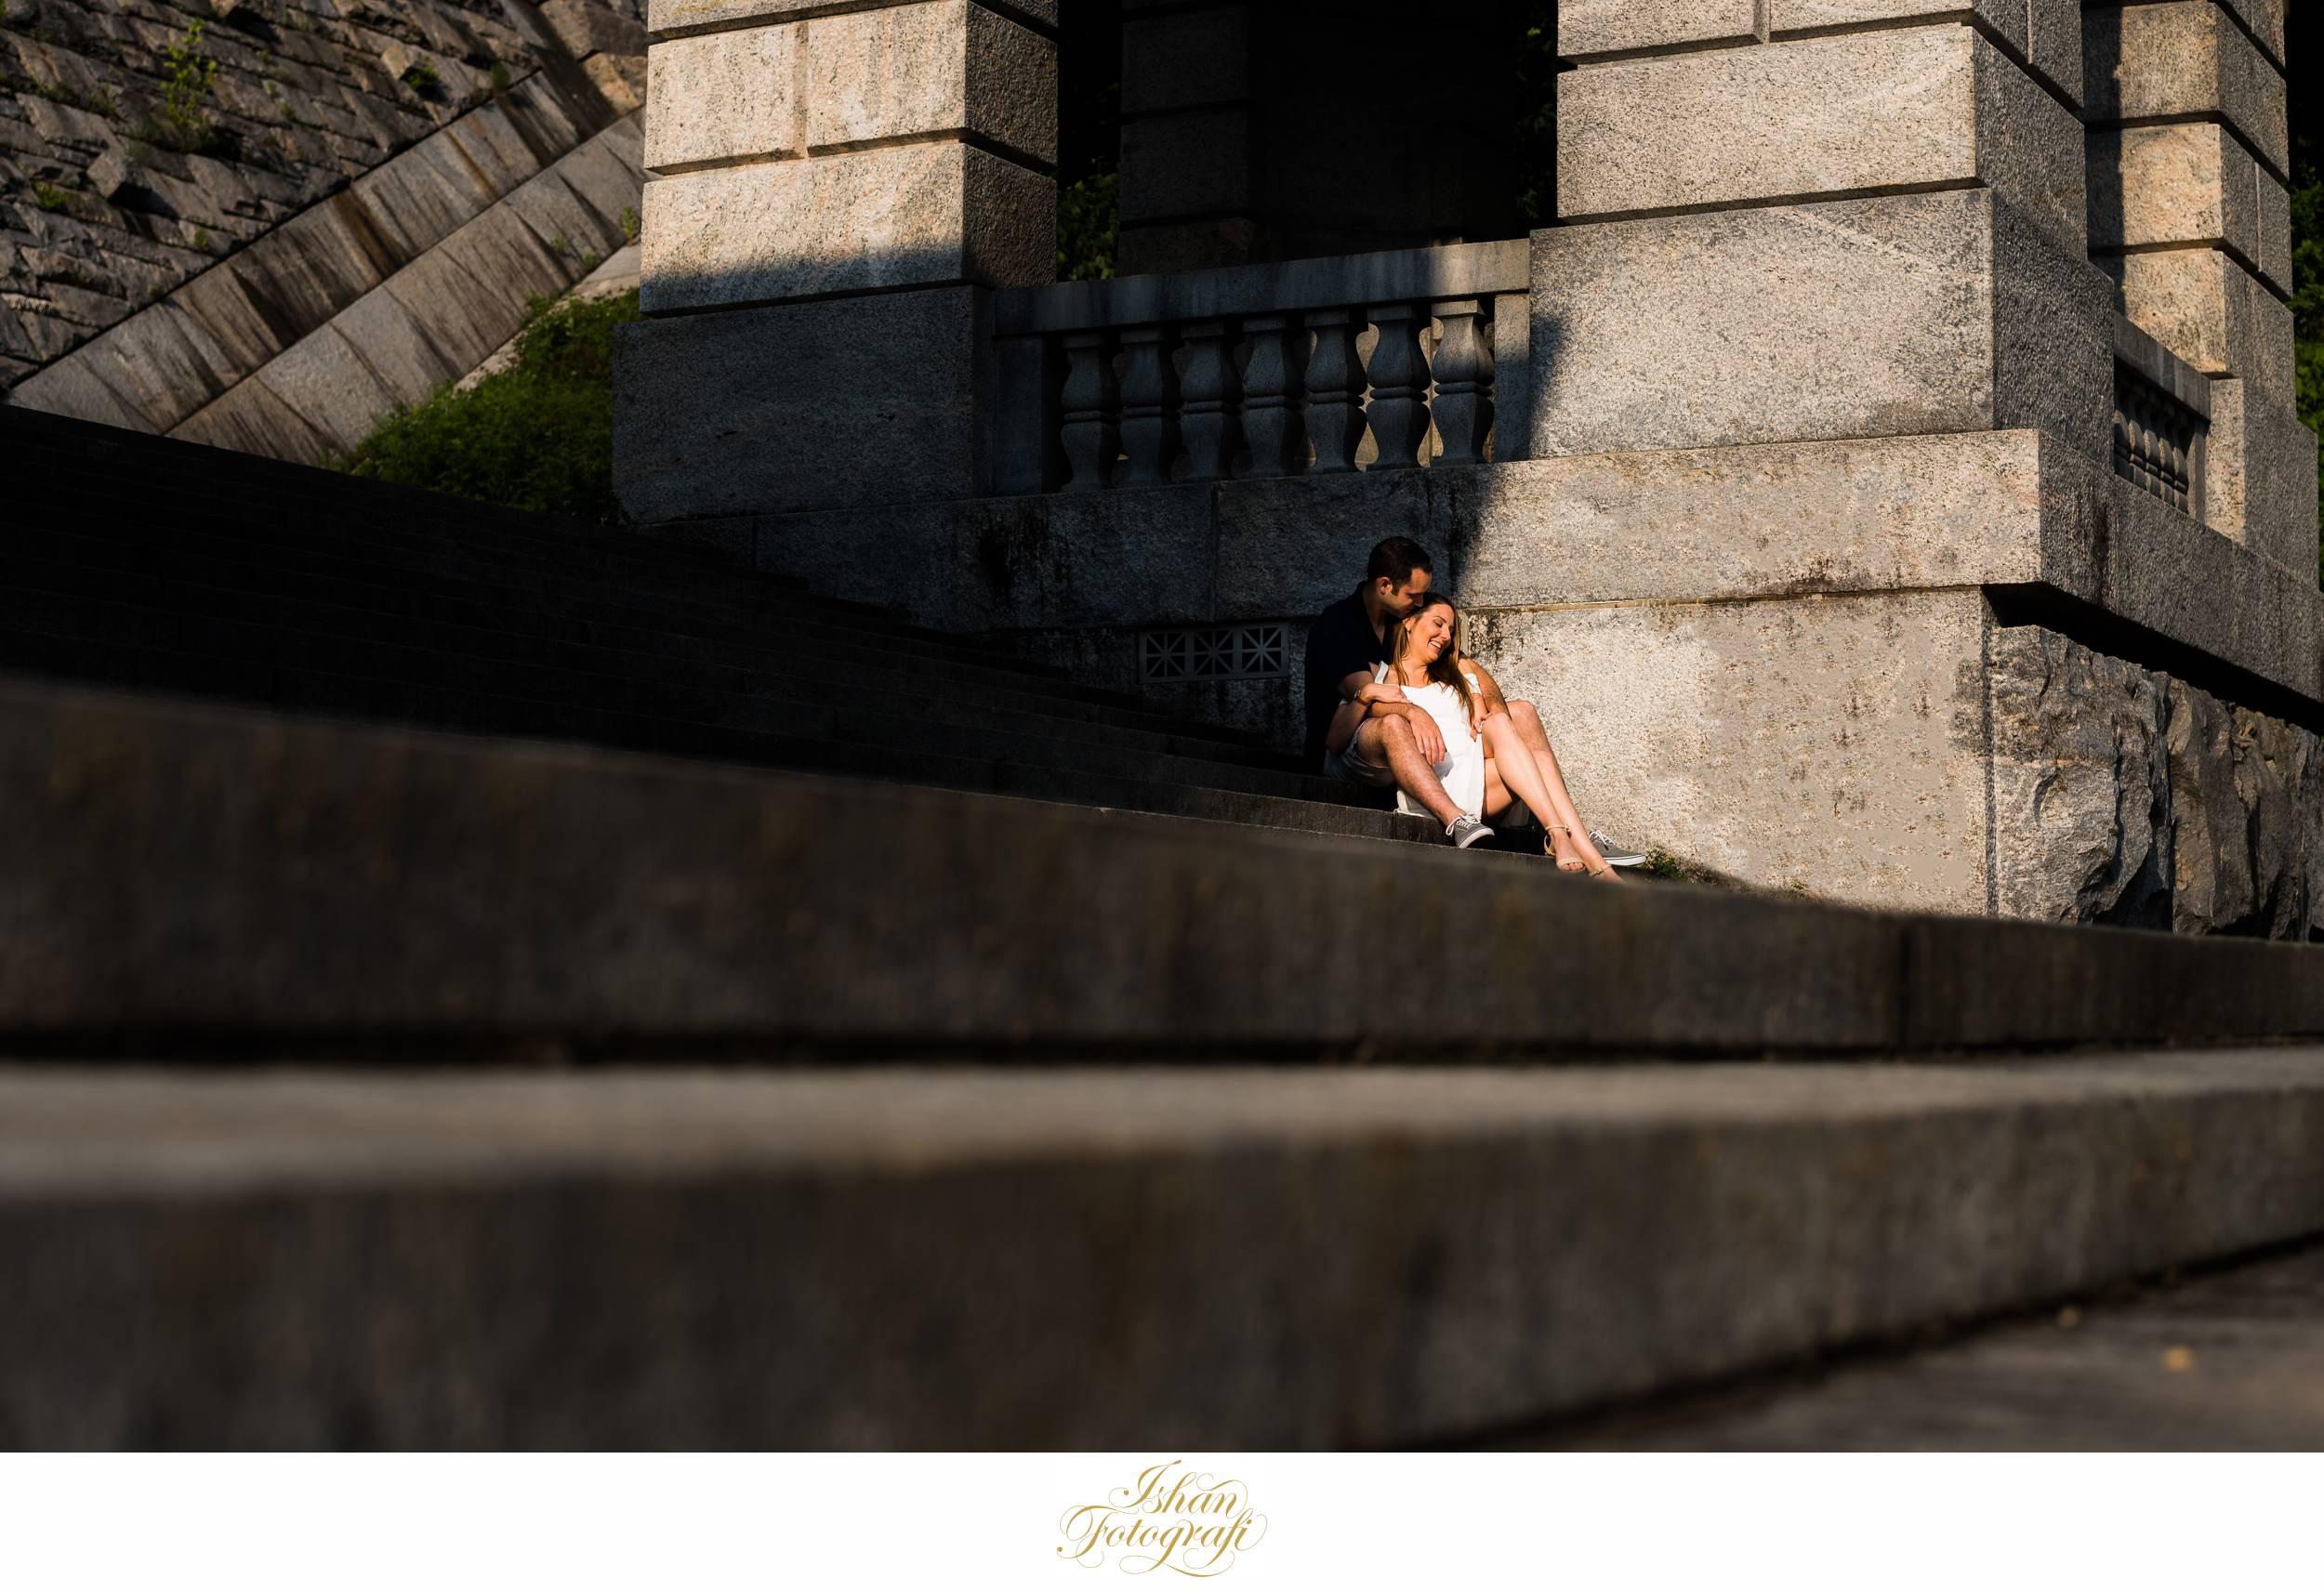 kensico-dam-engagement-photos